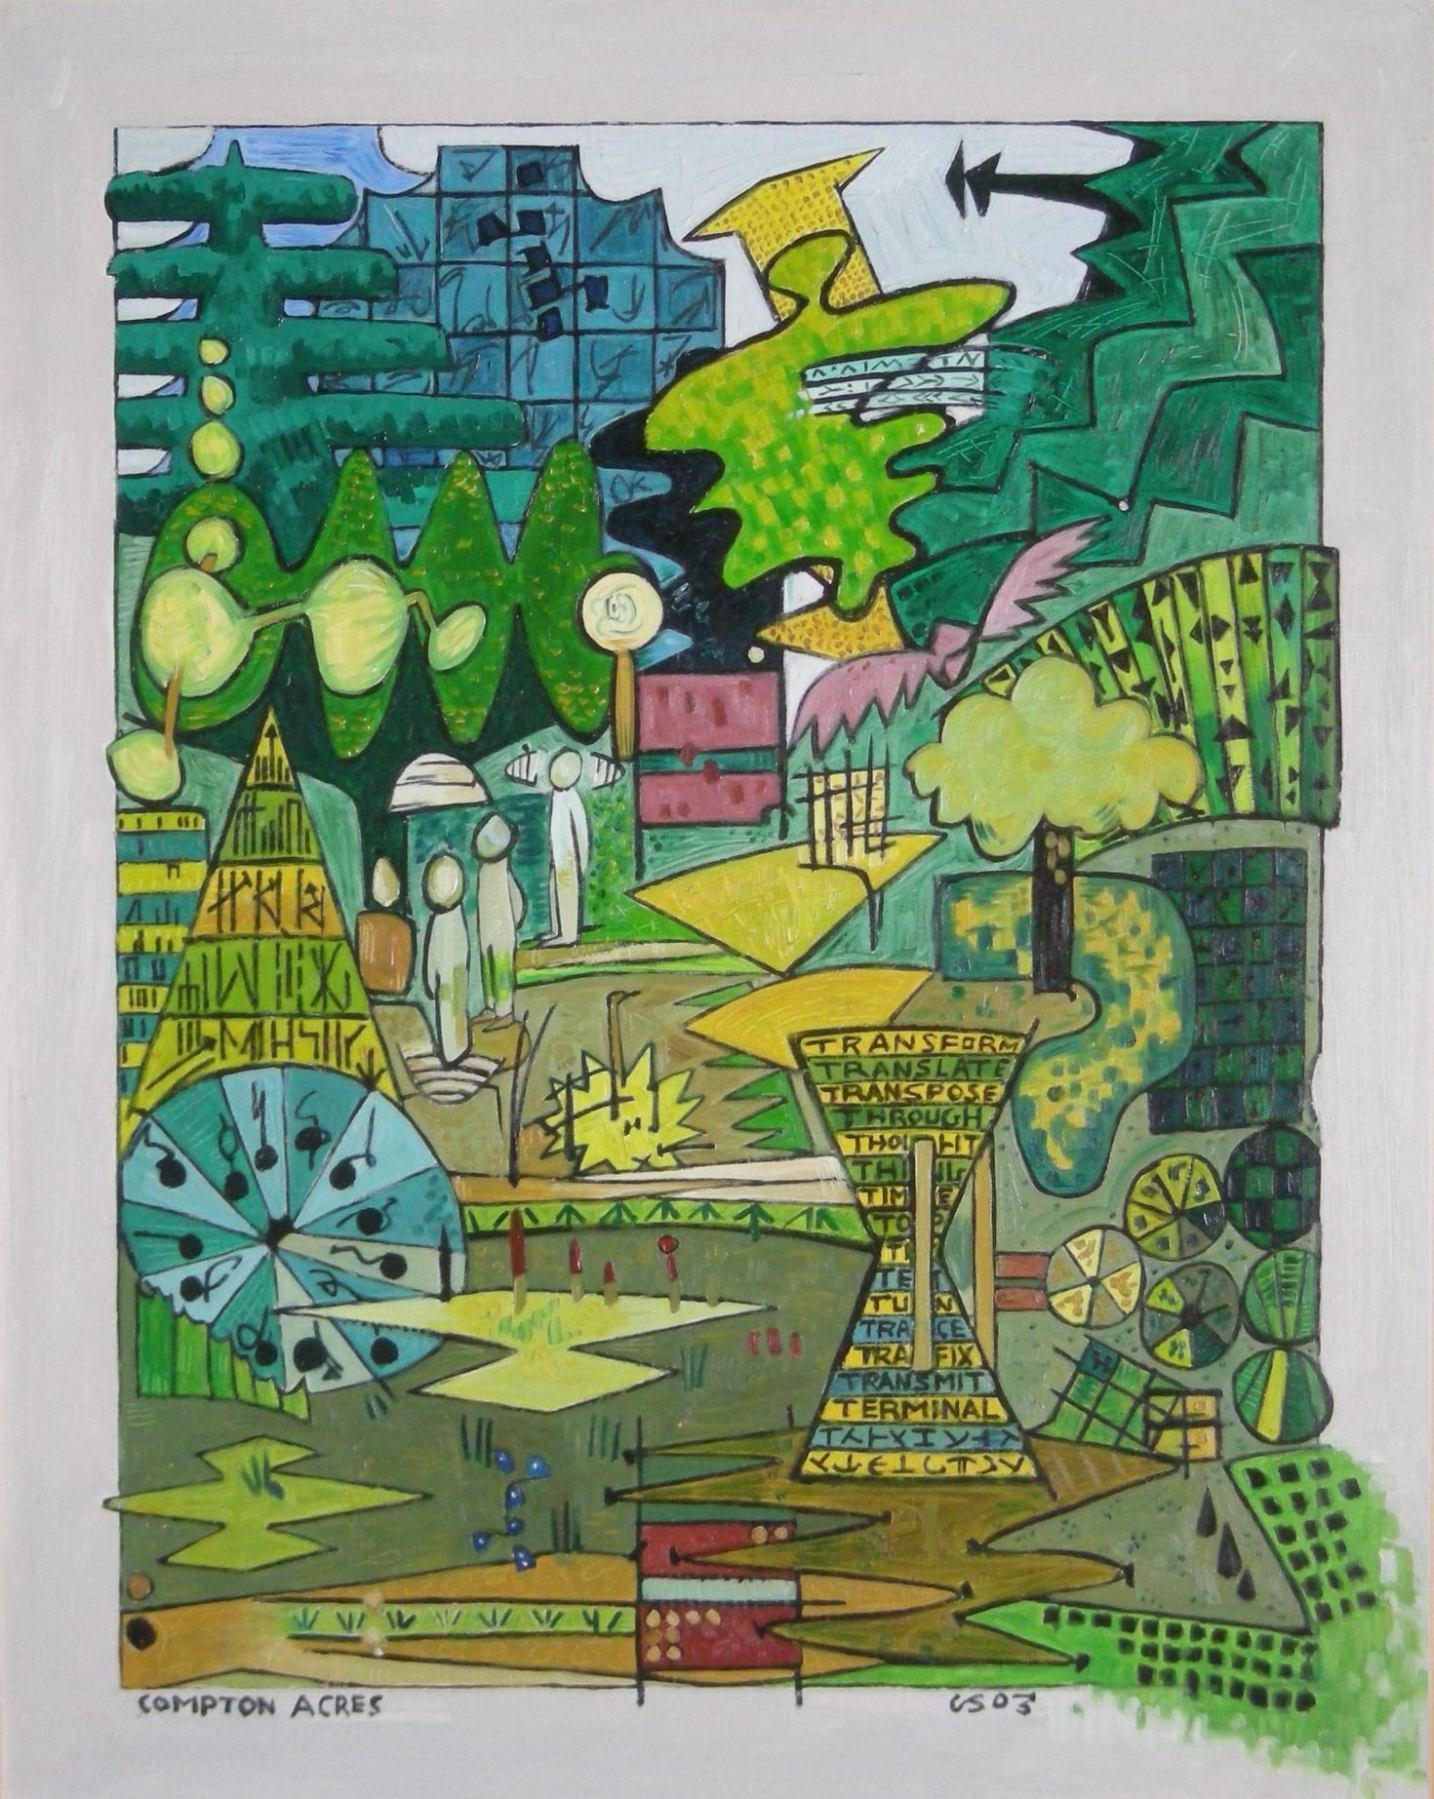 Compton Acres - Gerry Shepherd